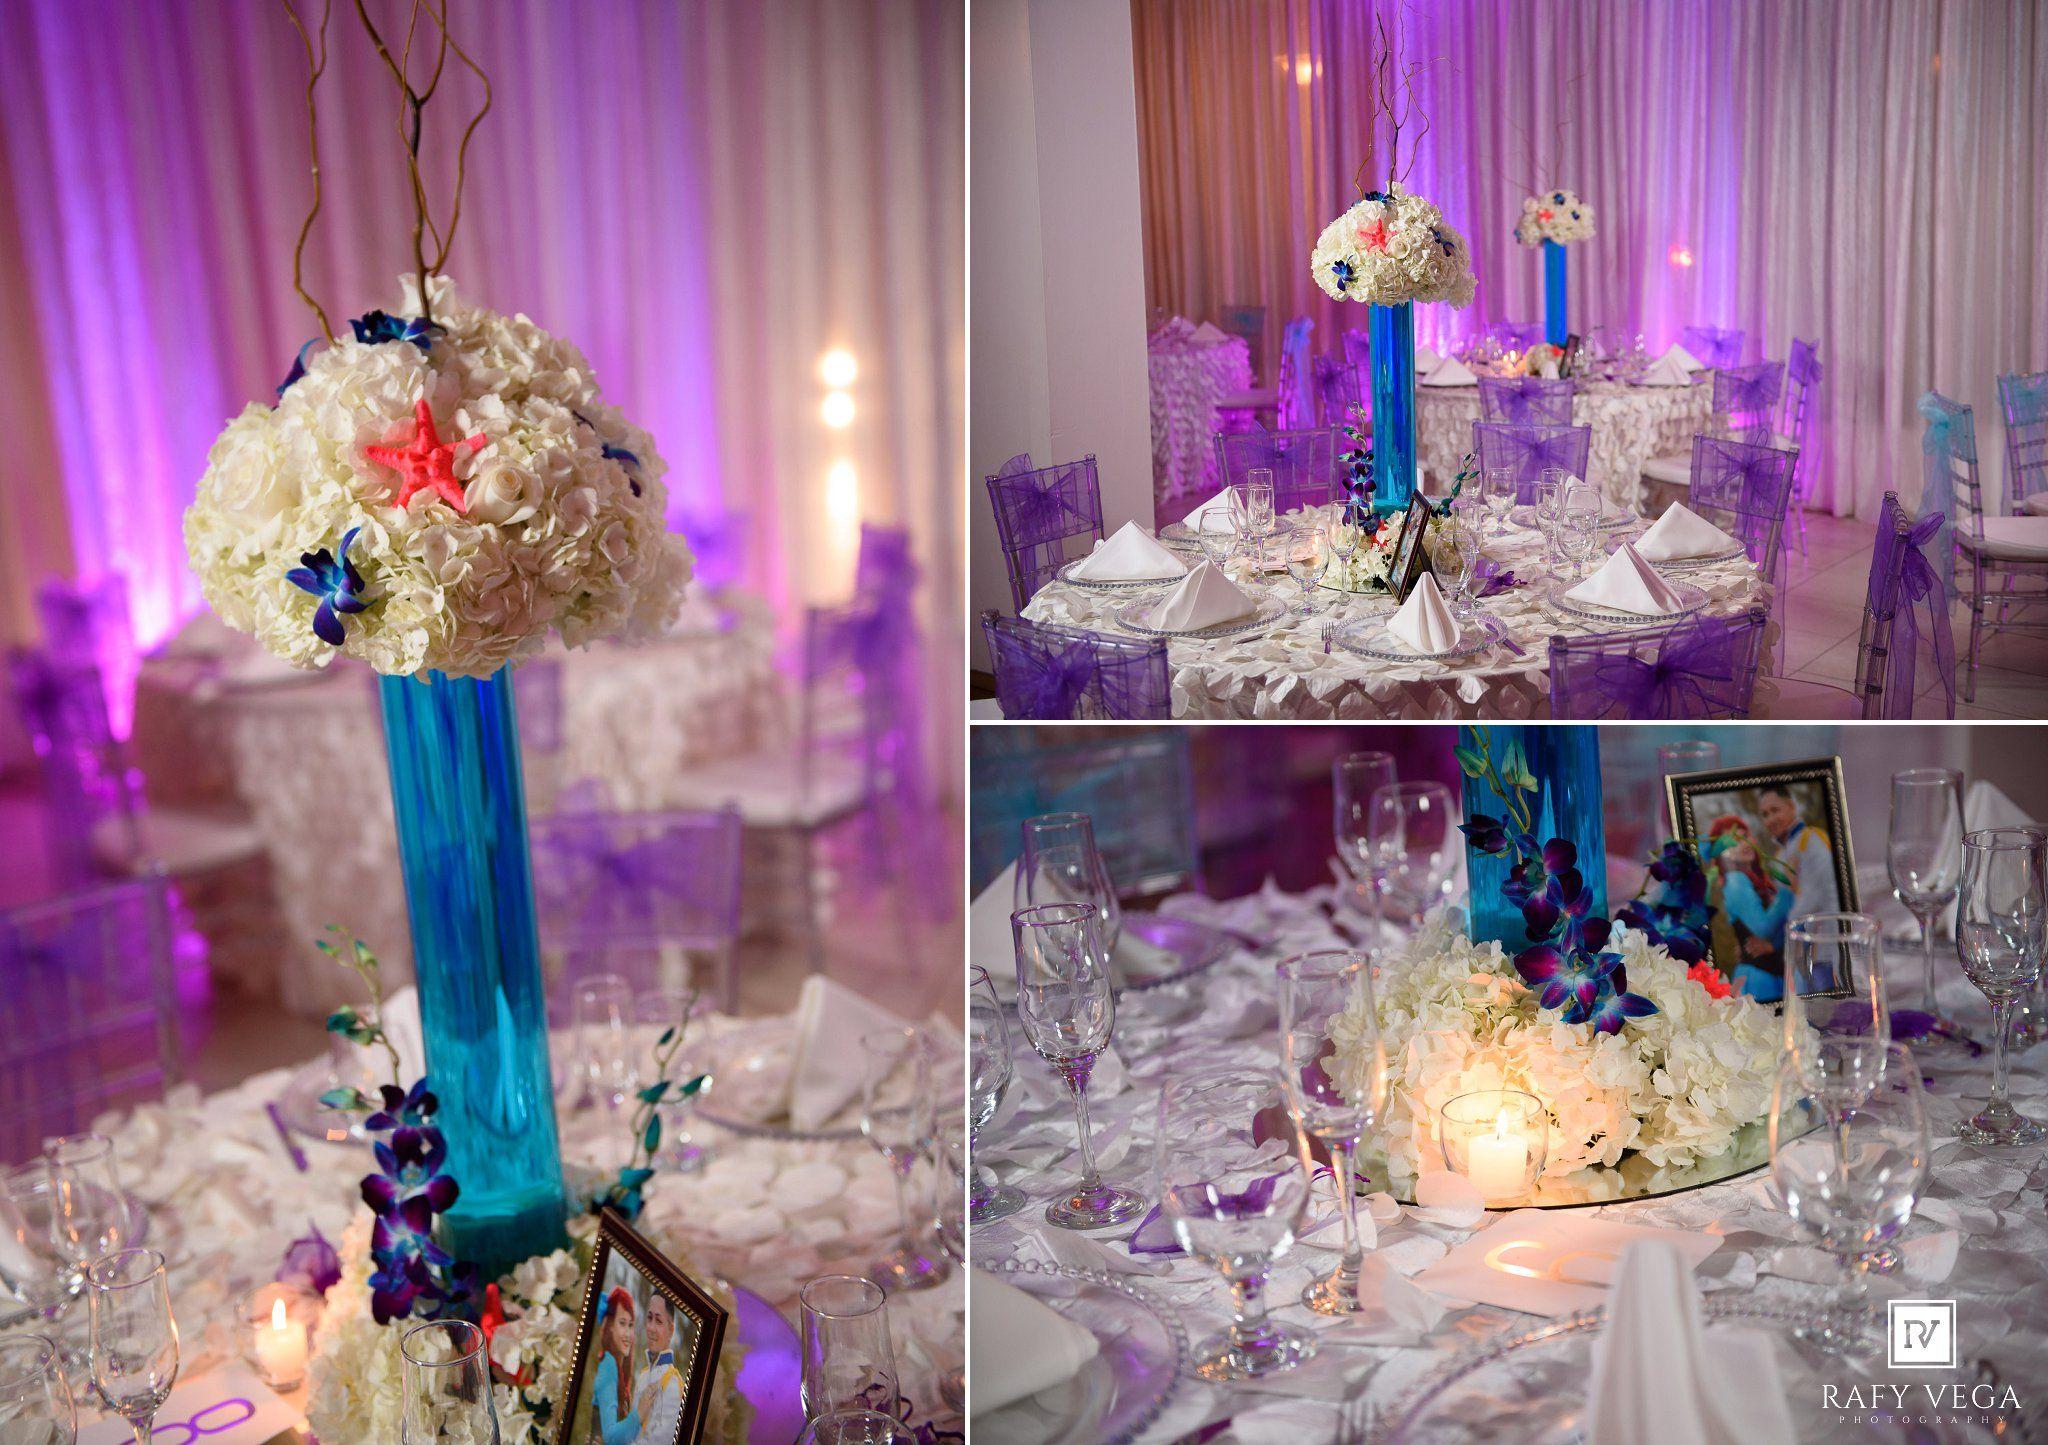 Disney Inspired Wedding In Puerto Rico By Rafy Vega Boda Inspirada En Disney Bodas Boda